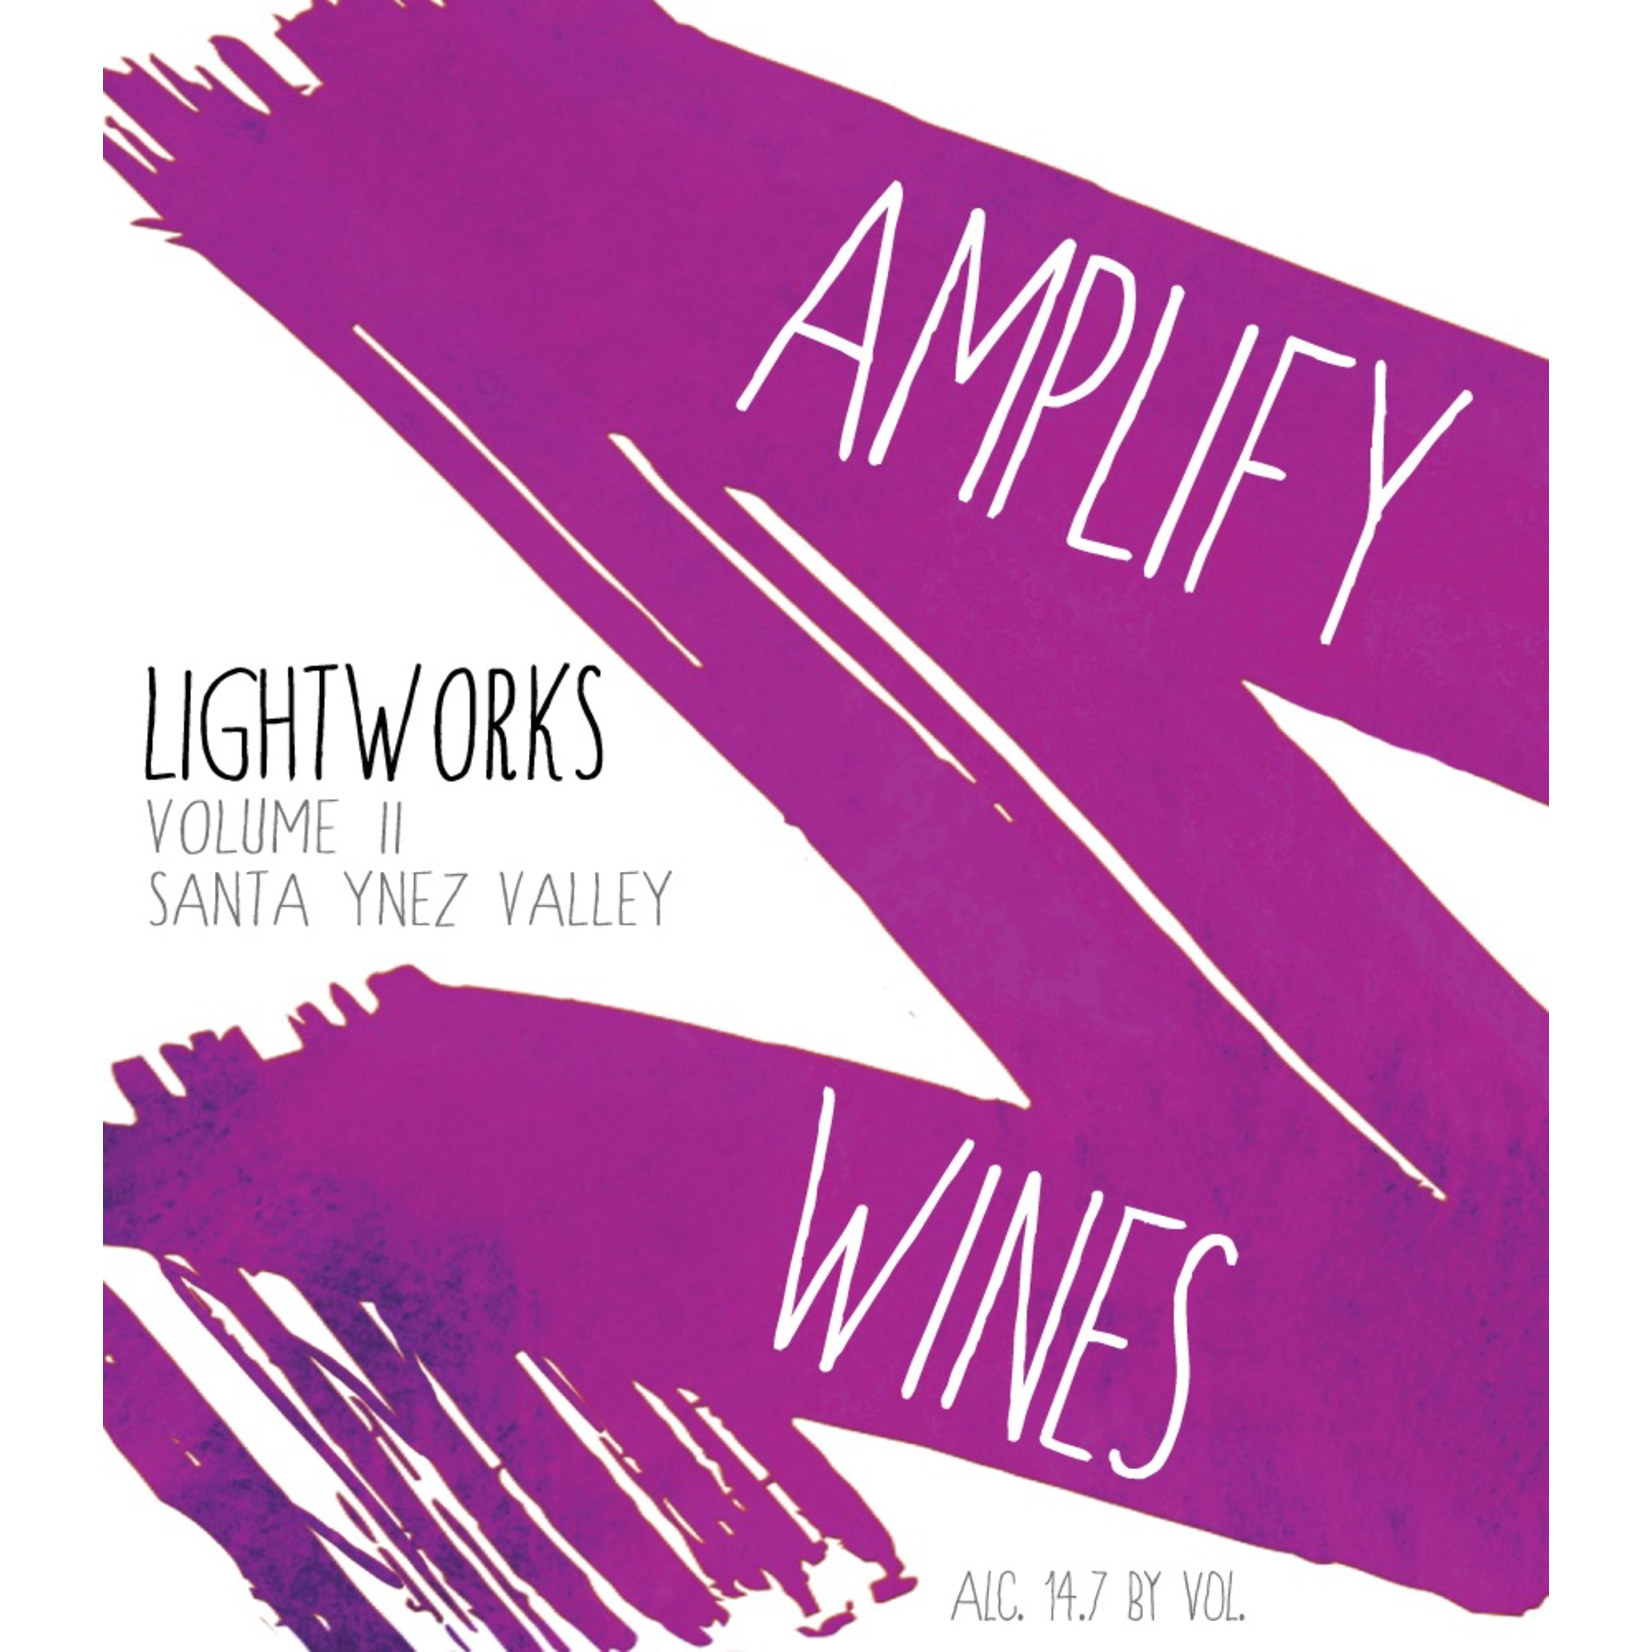 Amplify Wines Lightworks Merlot 2017 Vol II